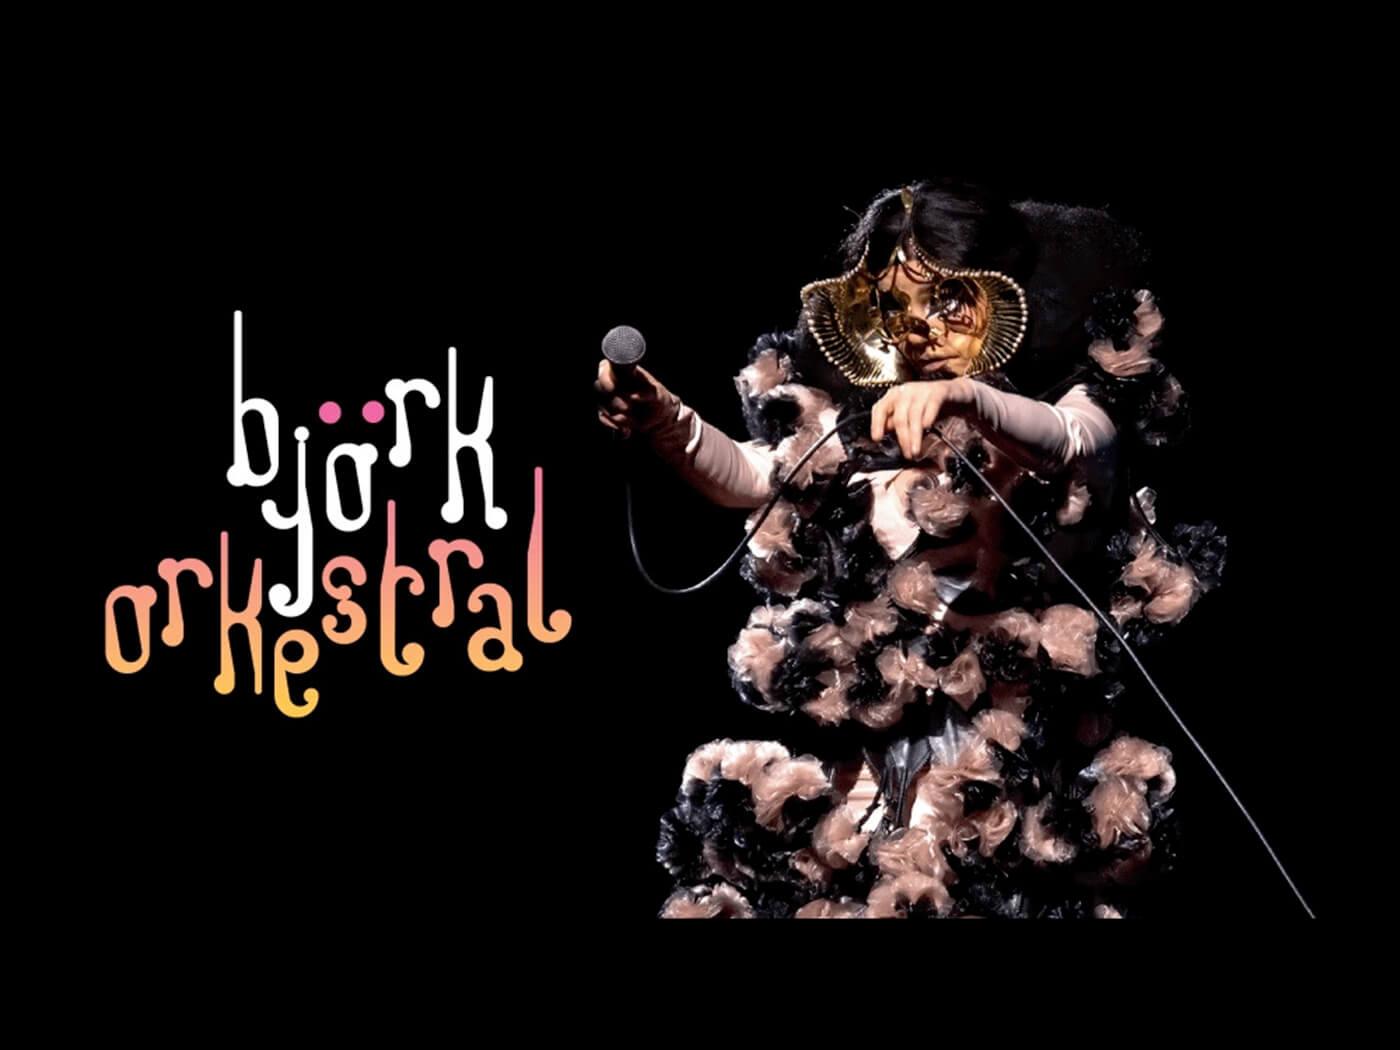 Björk to livestream three orchestral shows